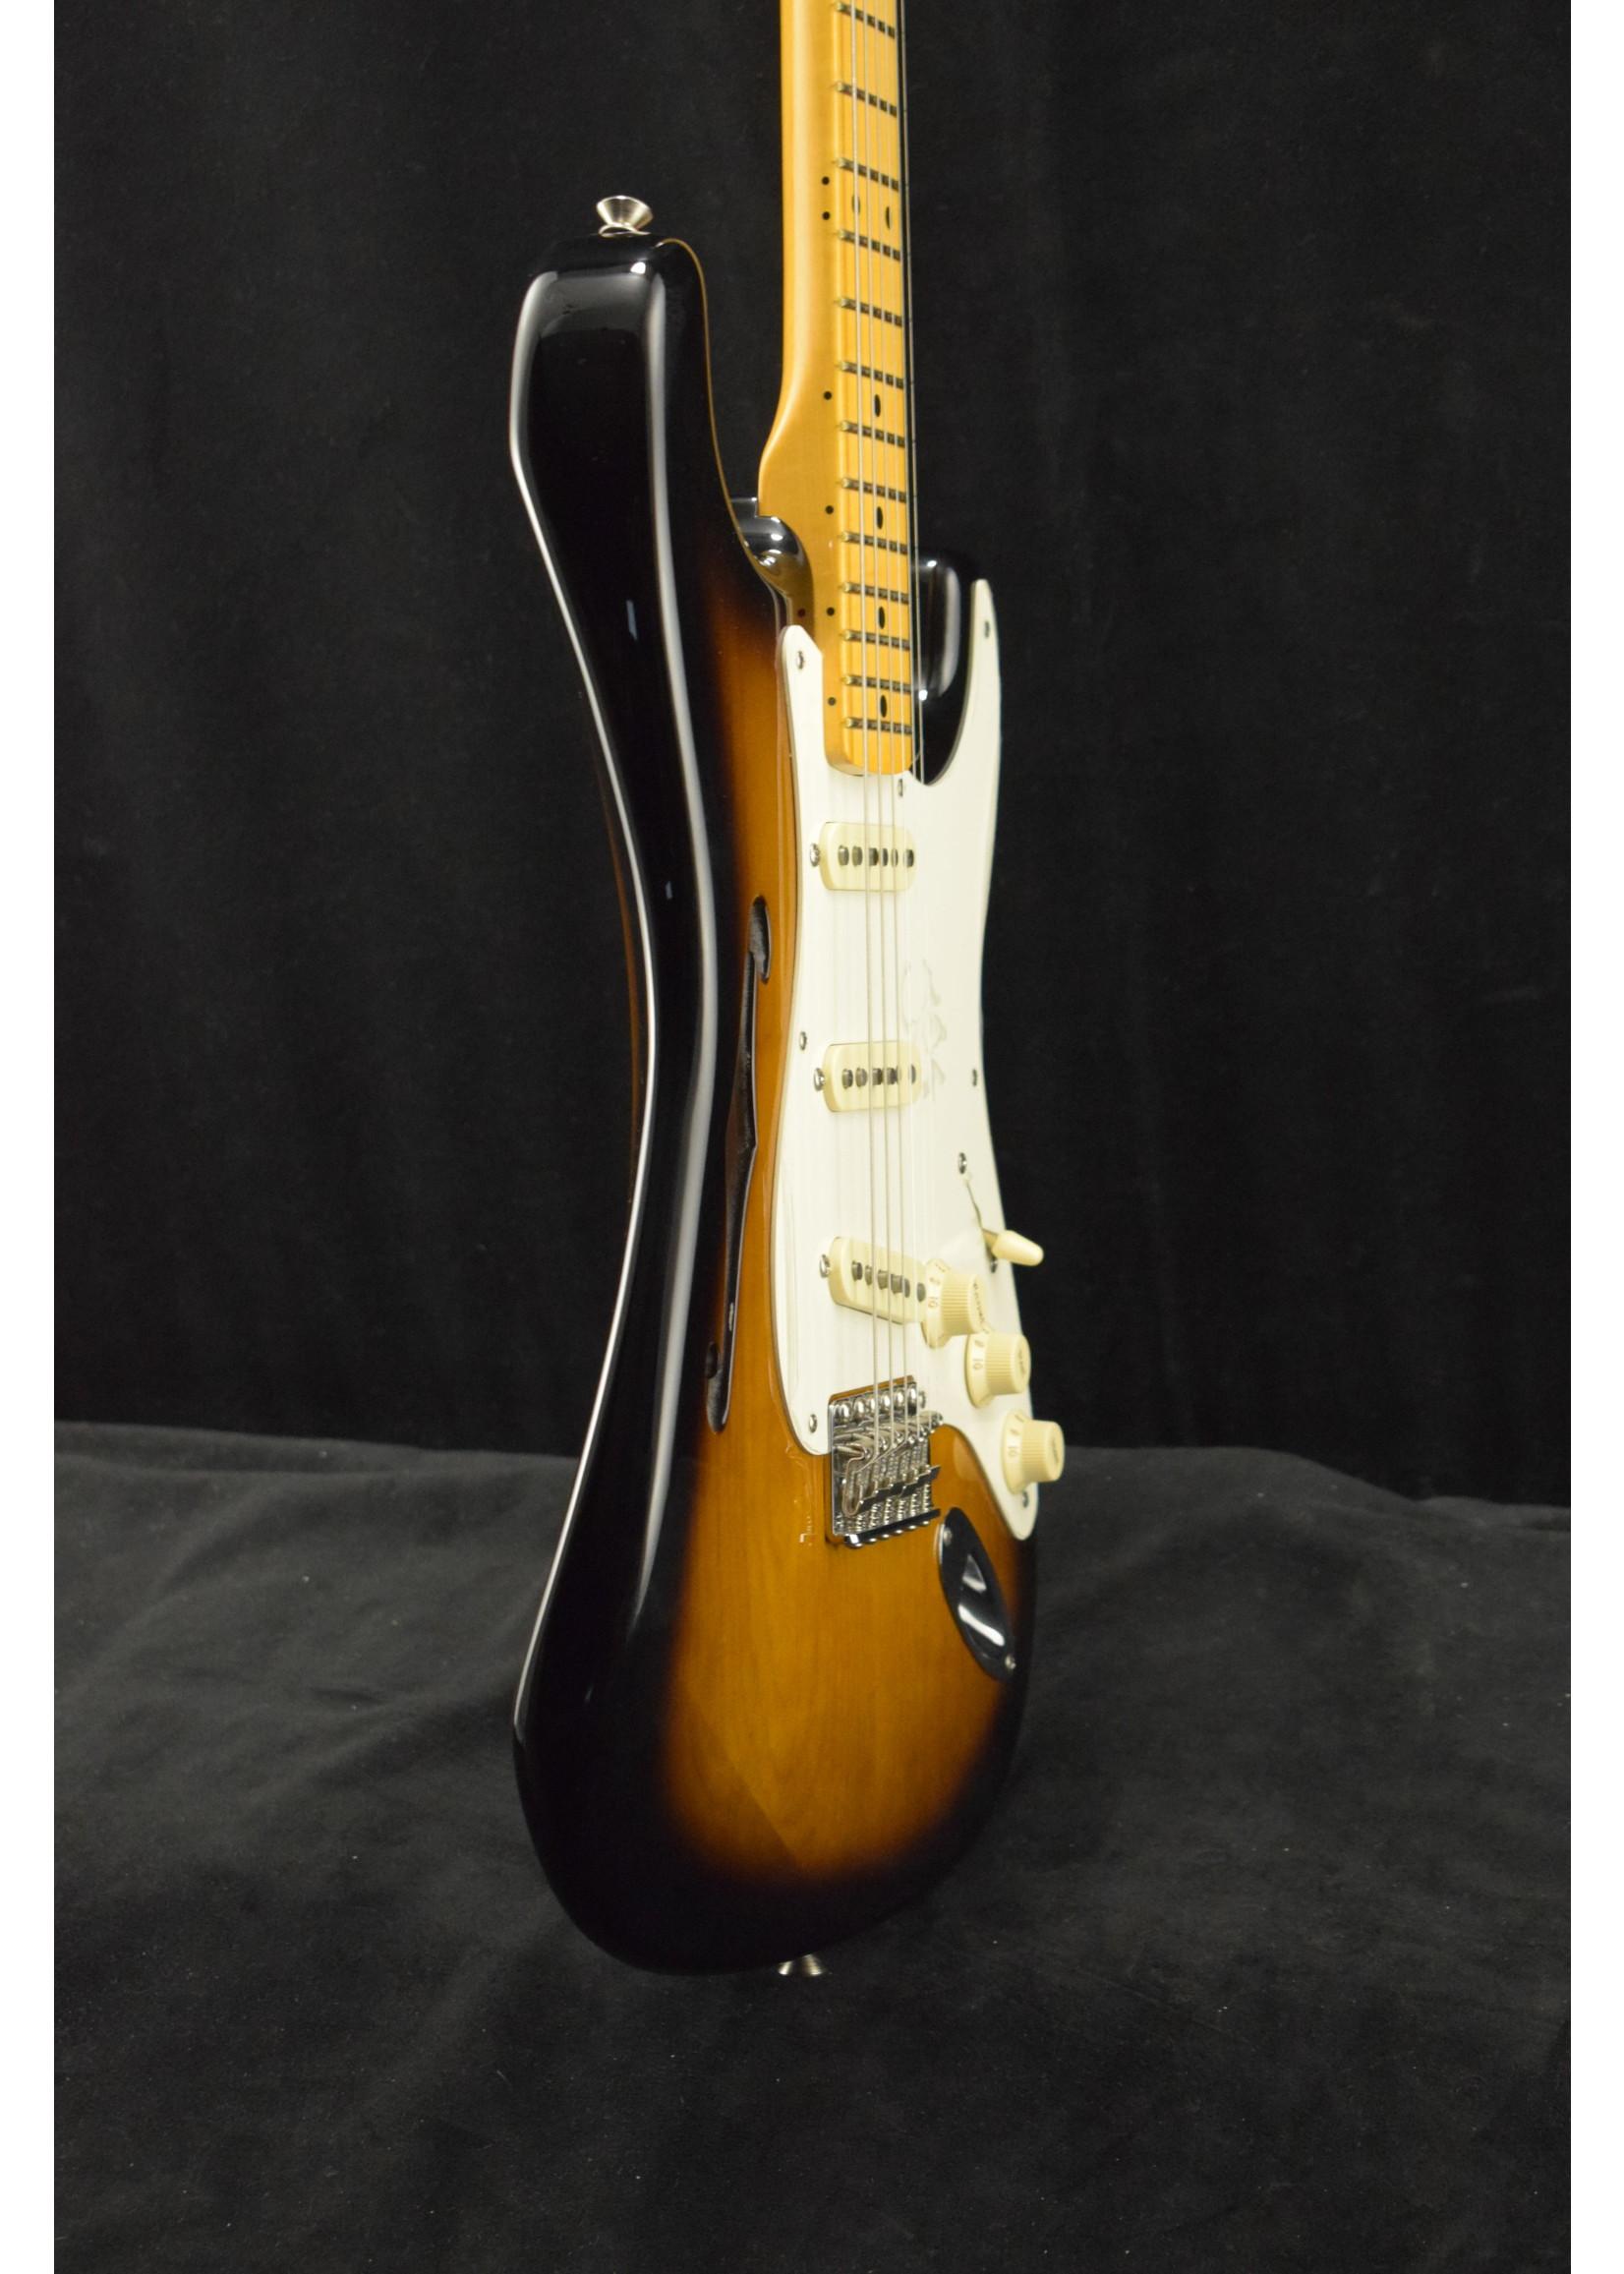 Fender Fender Eric Johnson Signature Stratocaster Thinline MN Maple Neck Sunburst SCRATCH & DENT